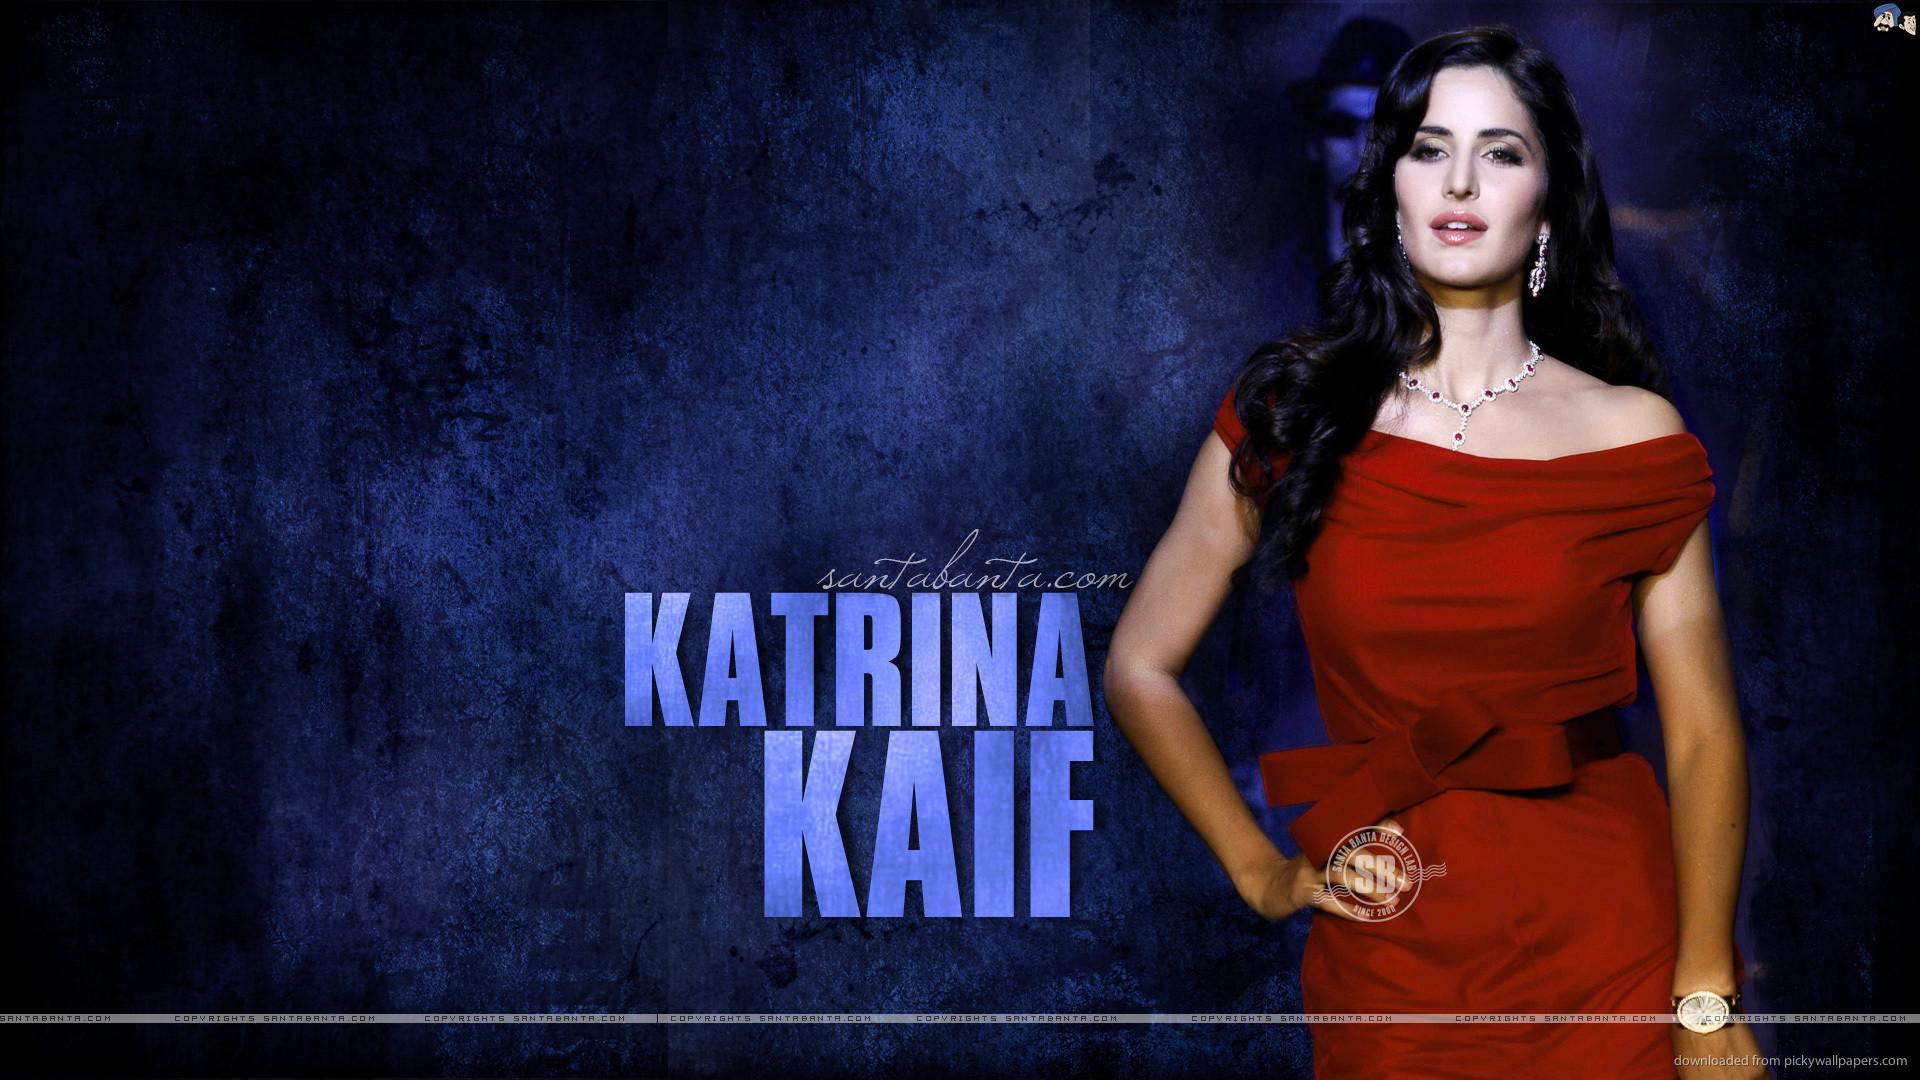 Katrina Kaif for 1920×1080